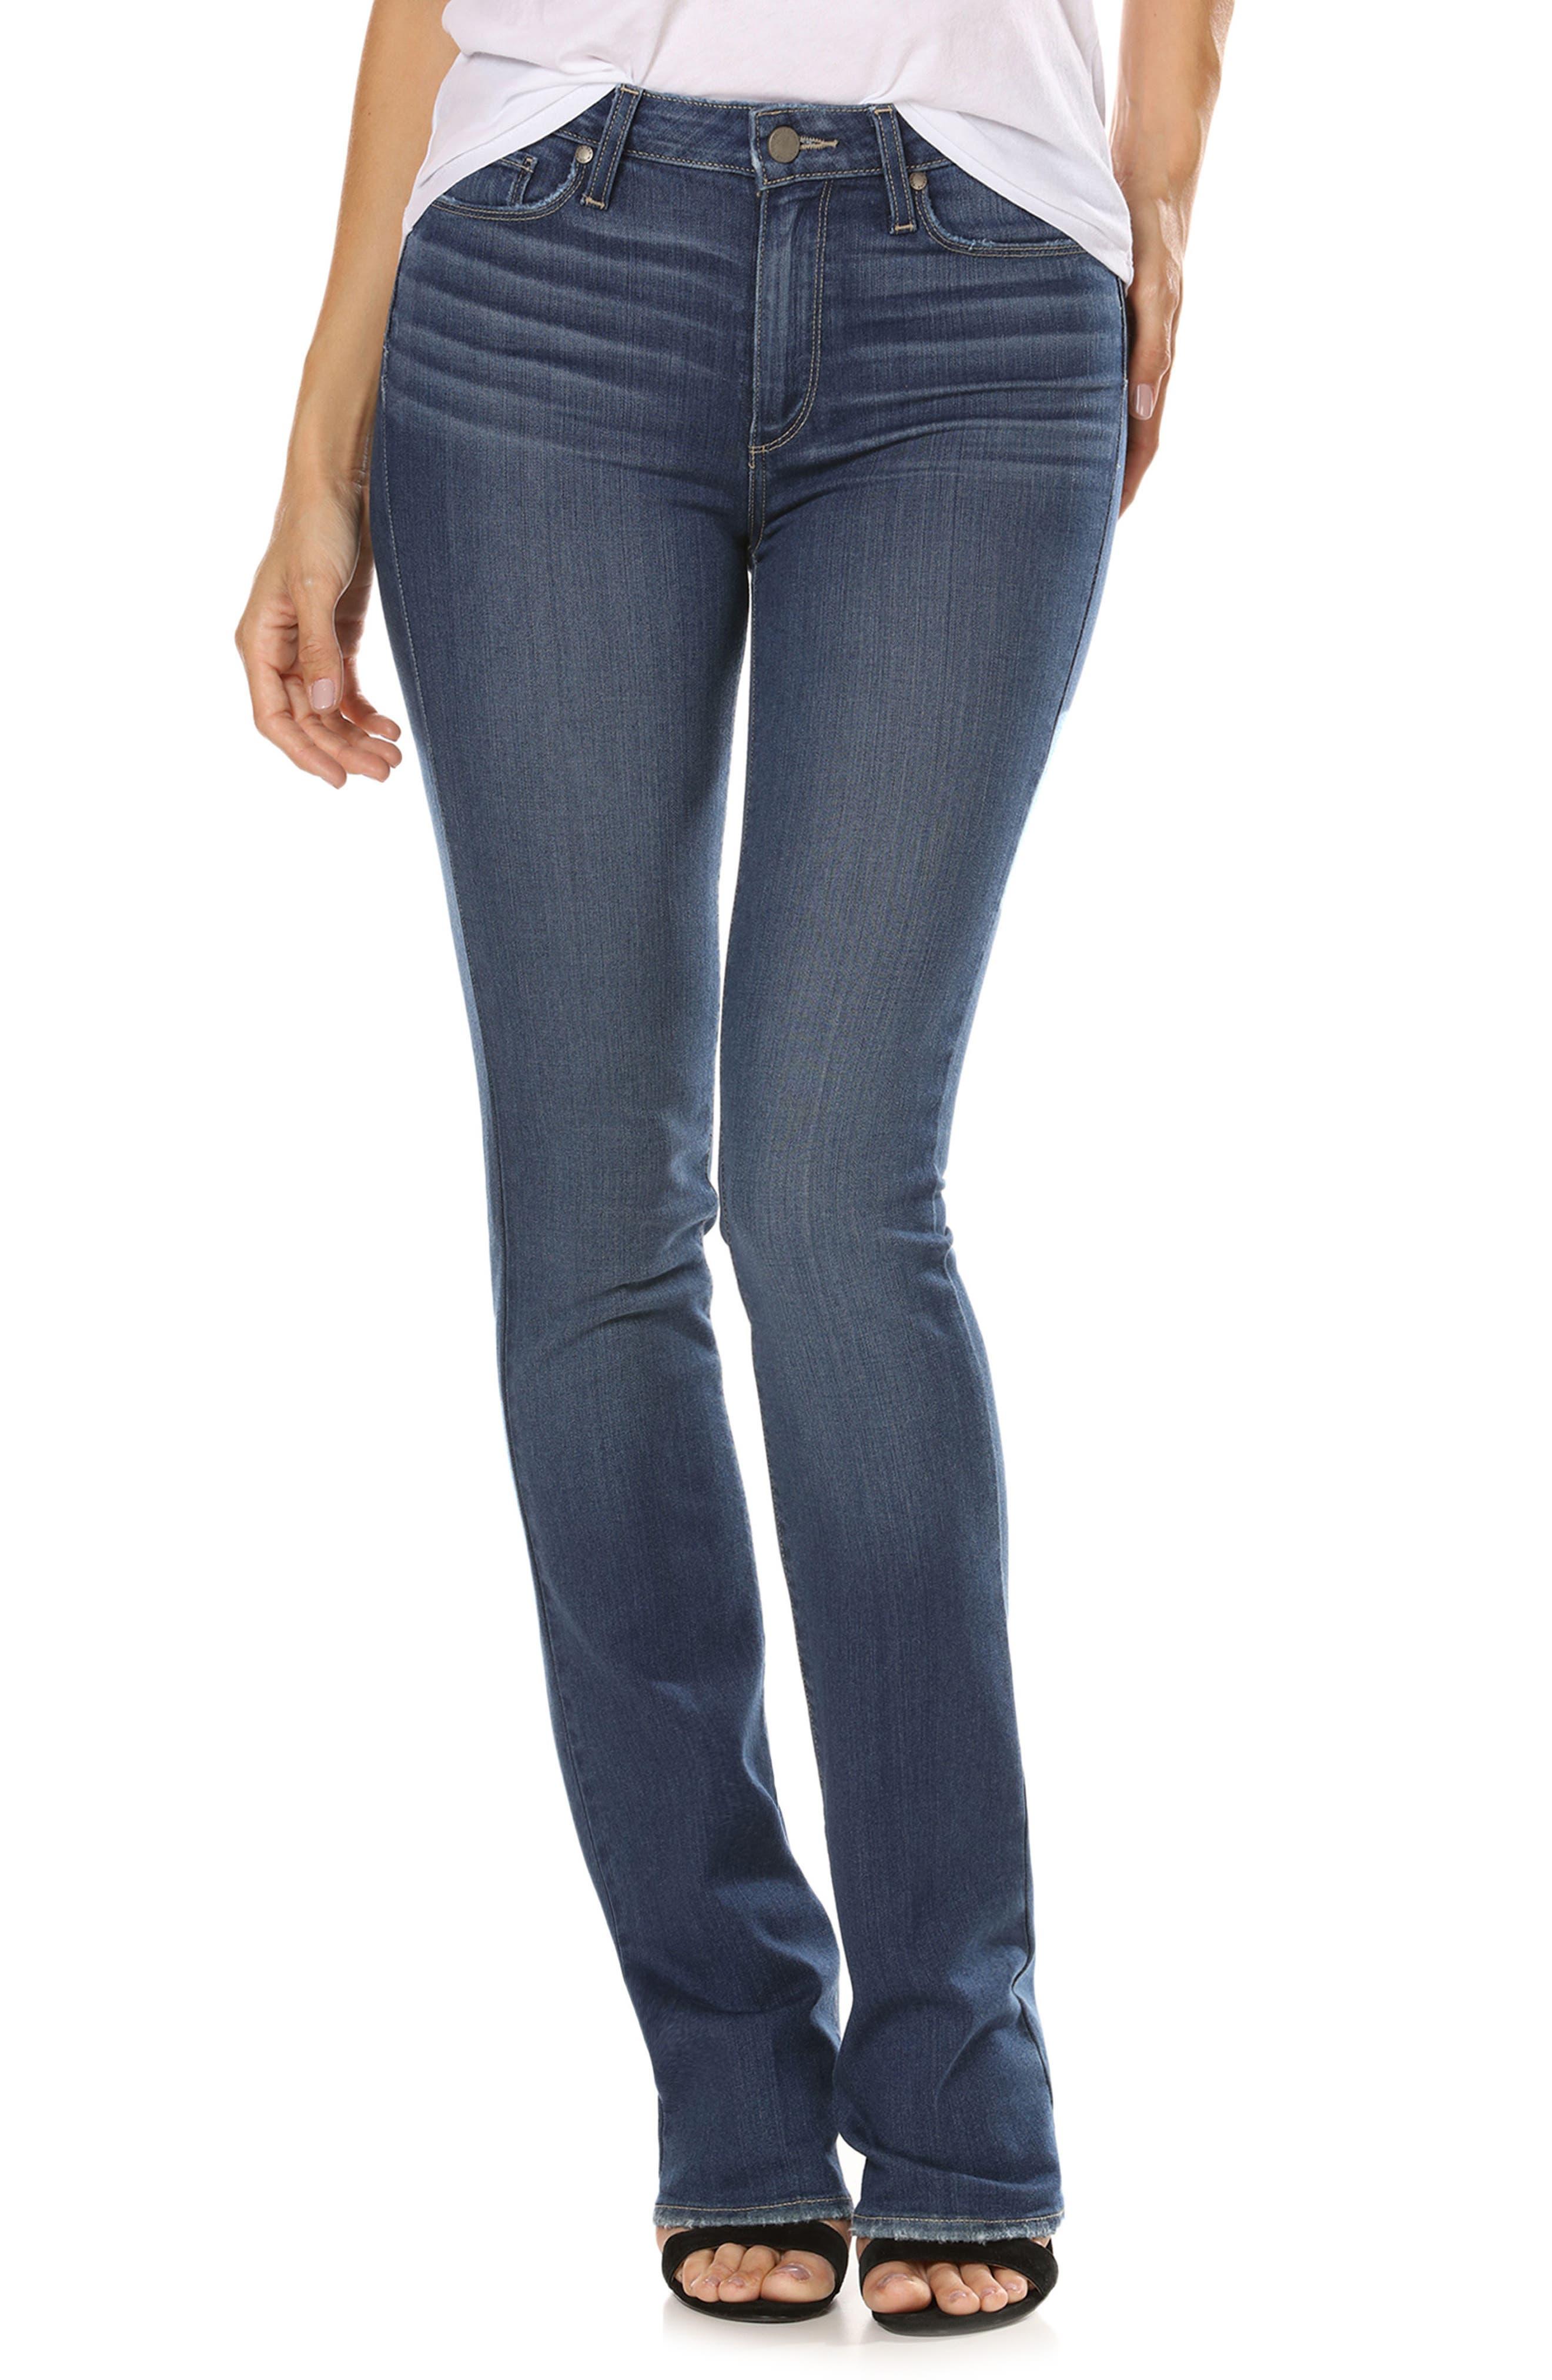 Transcend - Manhattan High Waist Bootcut Jeans,                             Main thumbnail 1, color,                             400